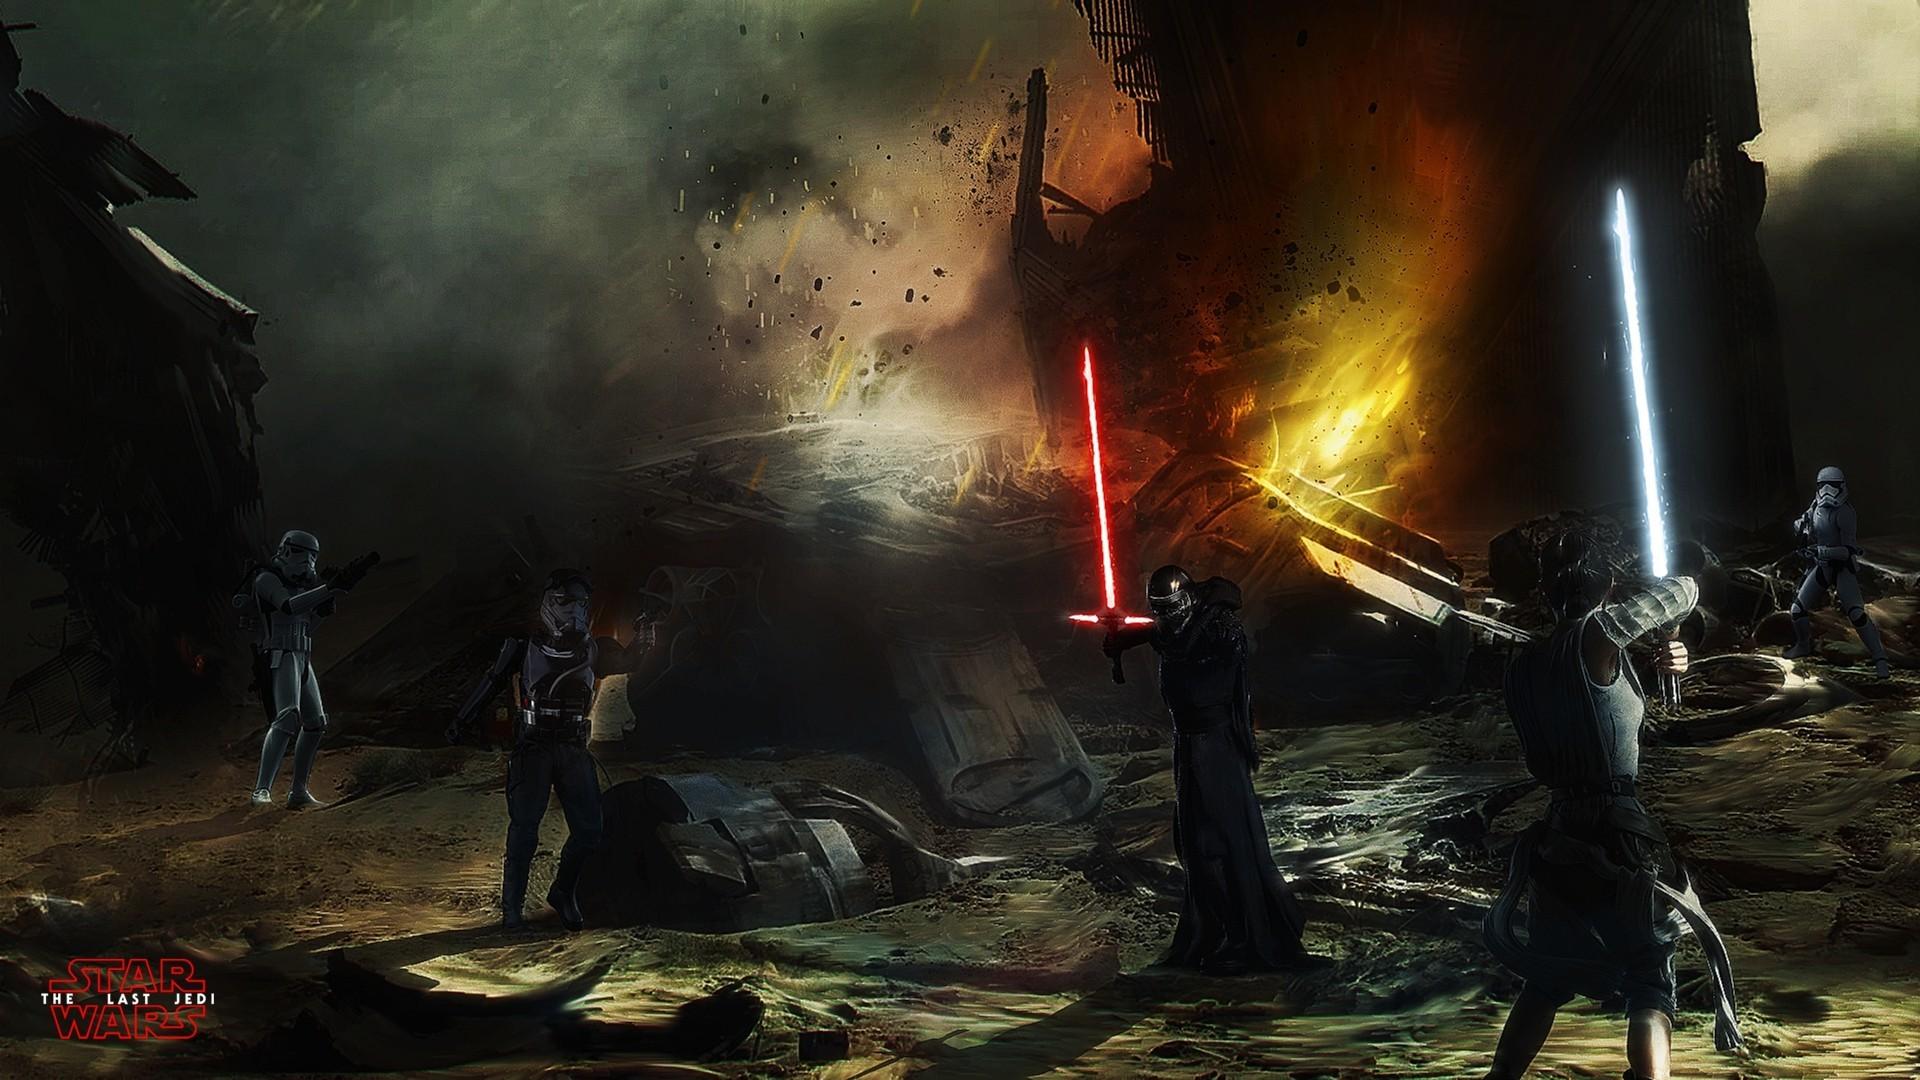 Star Wars The Last Jedi Desktop Wallpaper: Rey Star Wars HD Wallpaper (65+ Images